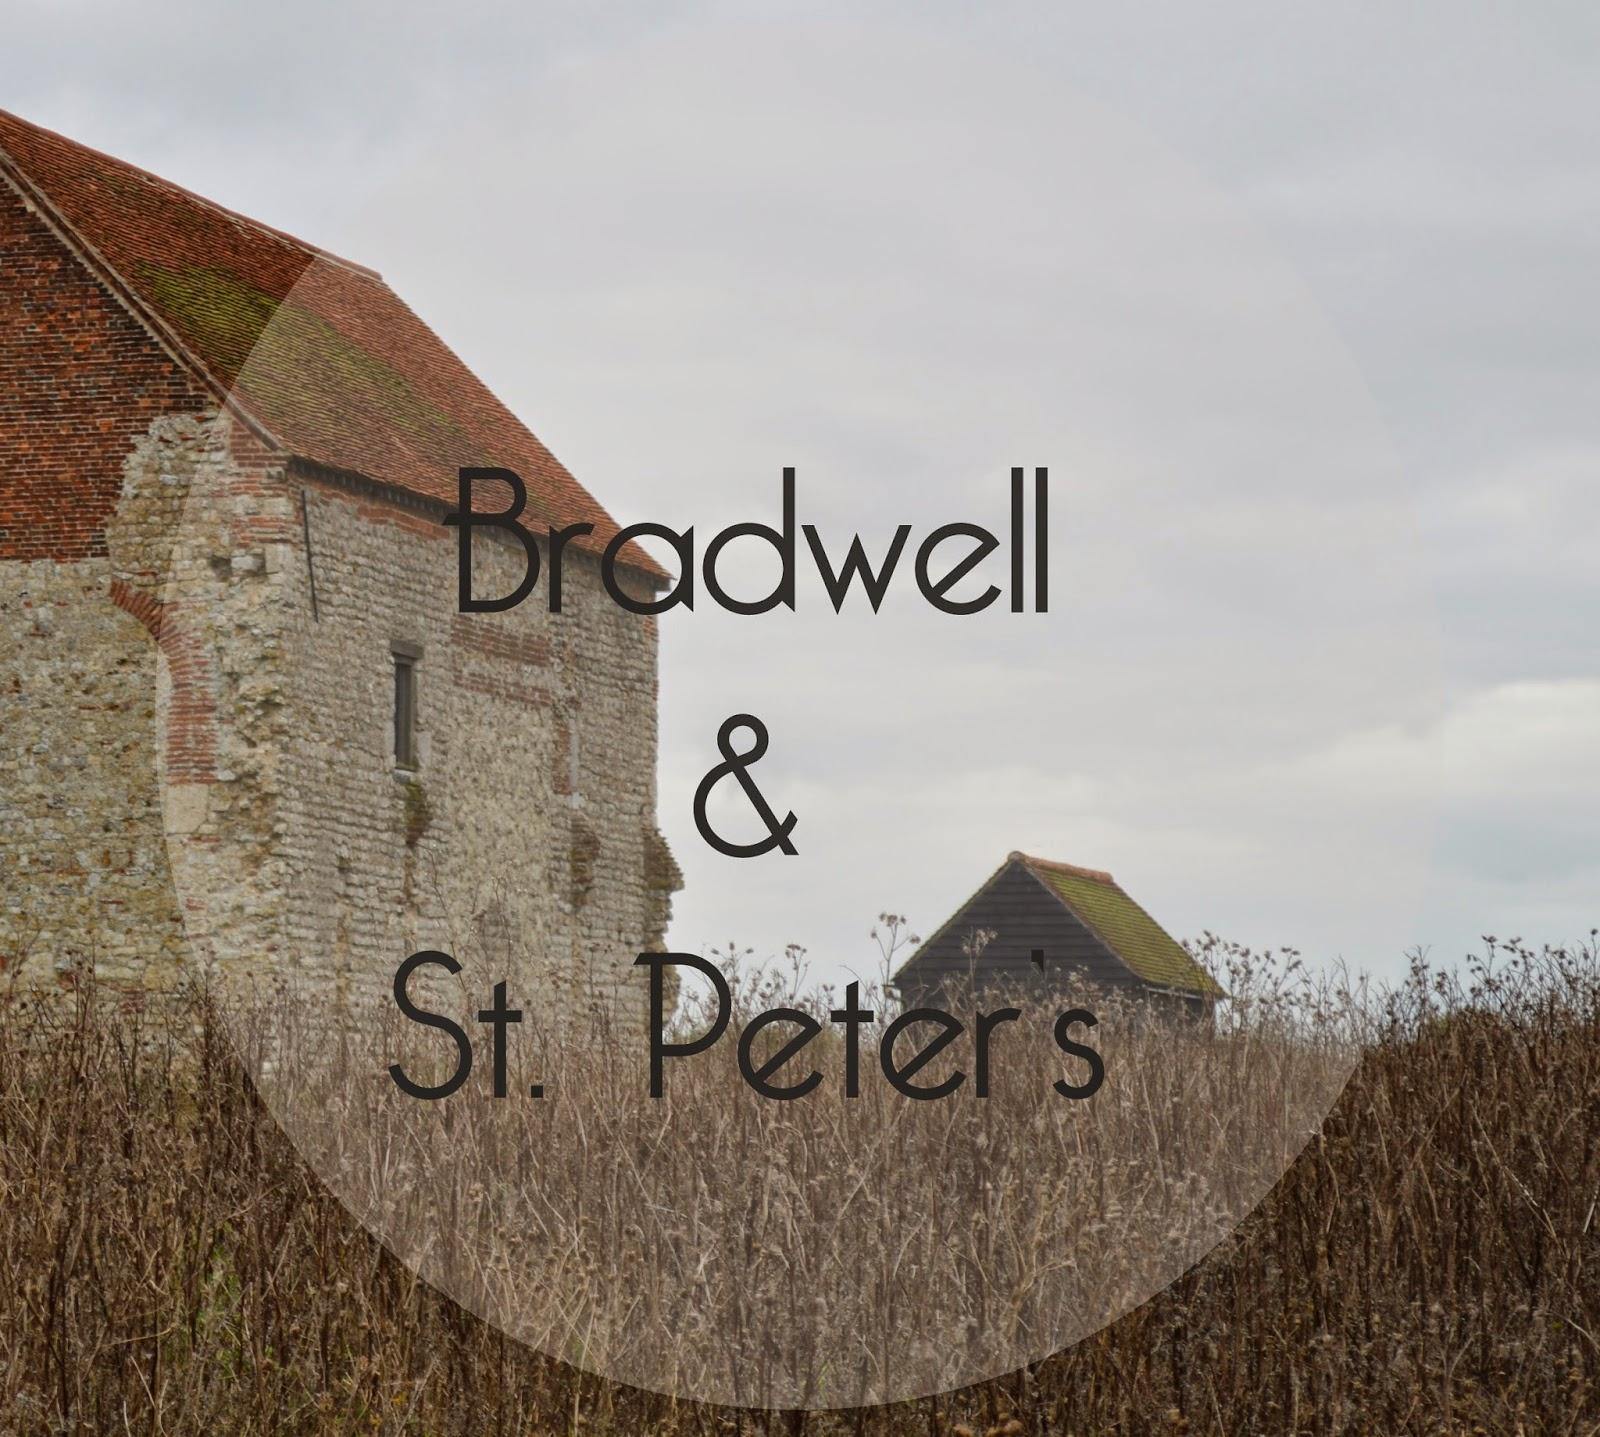 Bradwell, Essex, walk, photo, photograph, St Peter's Chapel, oldest Christian church, UK, visit, landscape, bleak, grey, fields, wind turbines